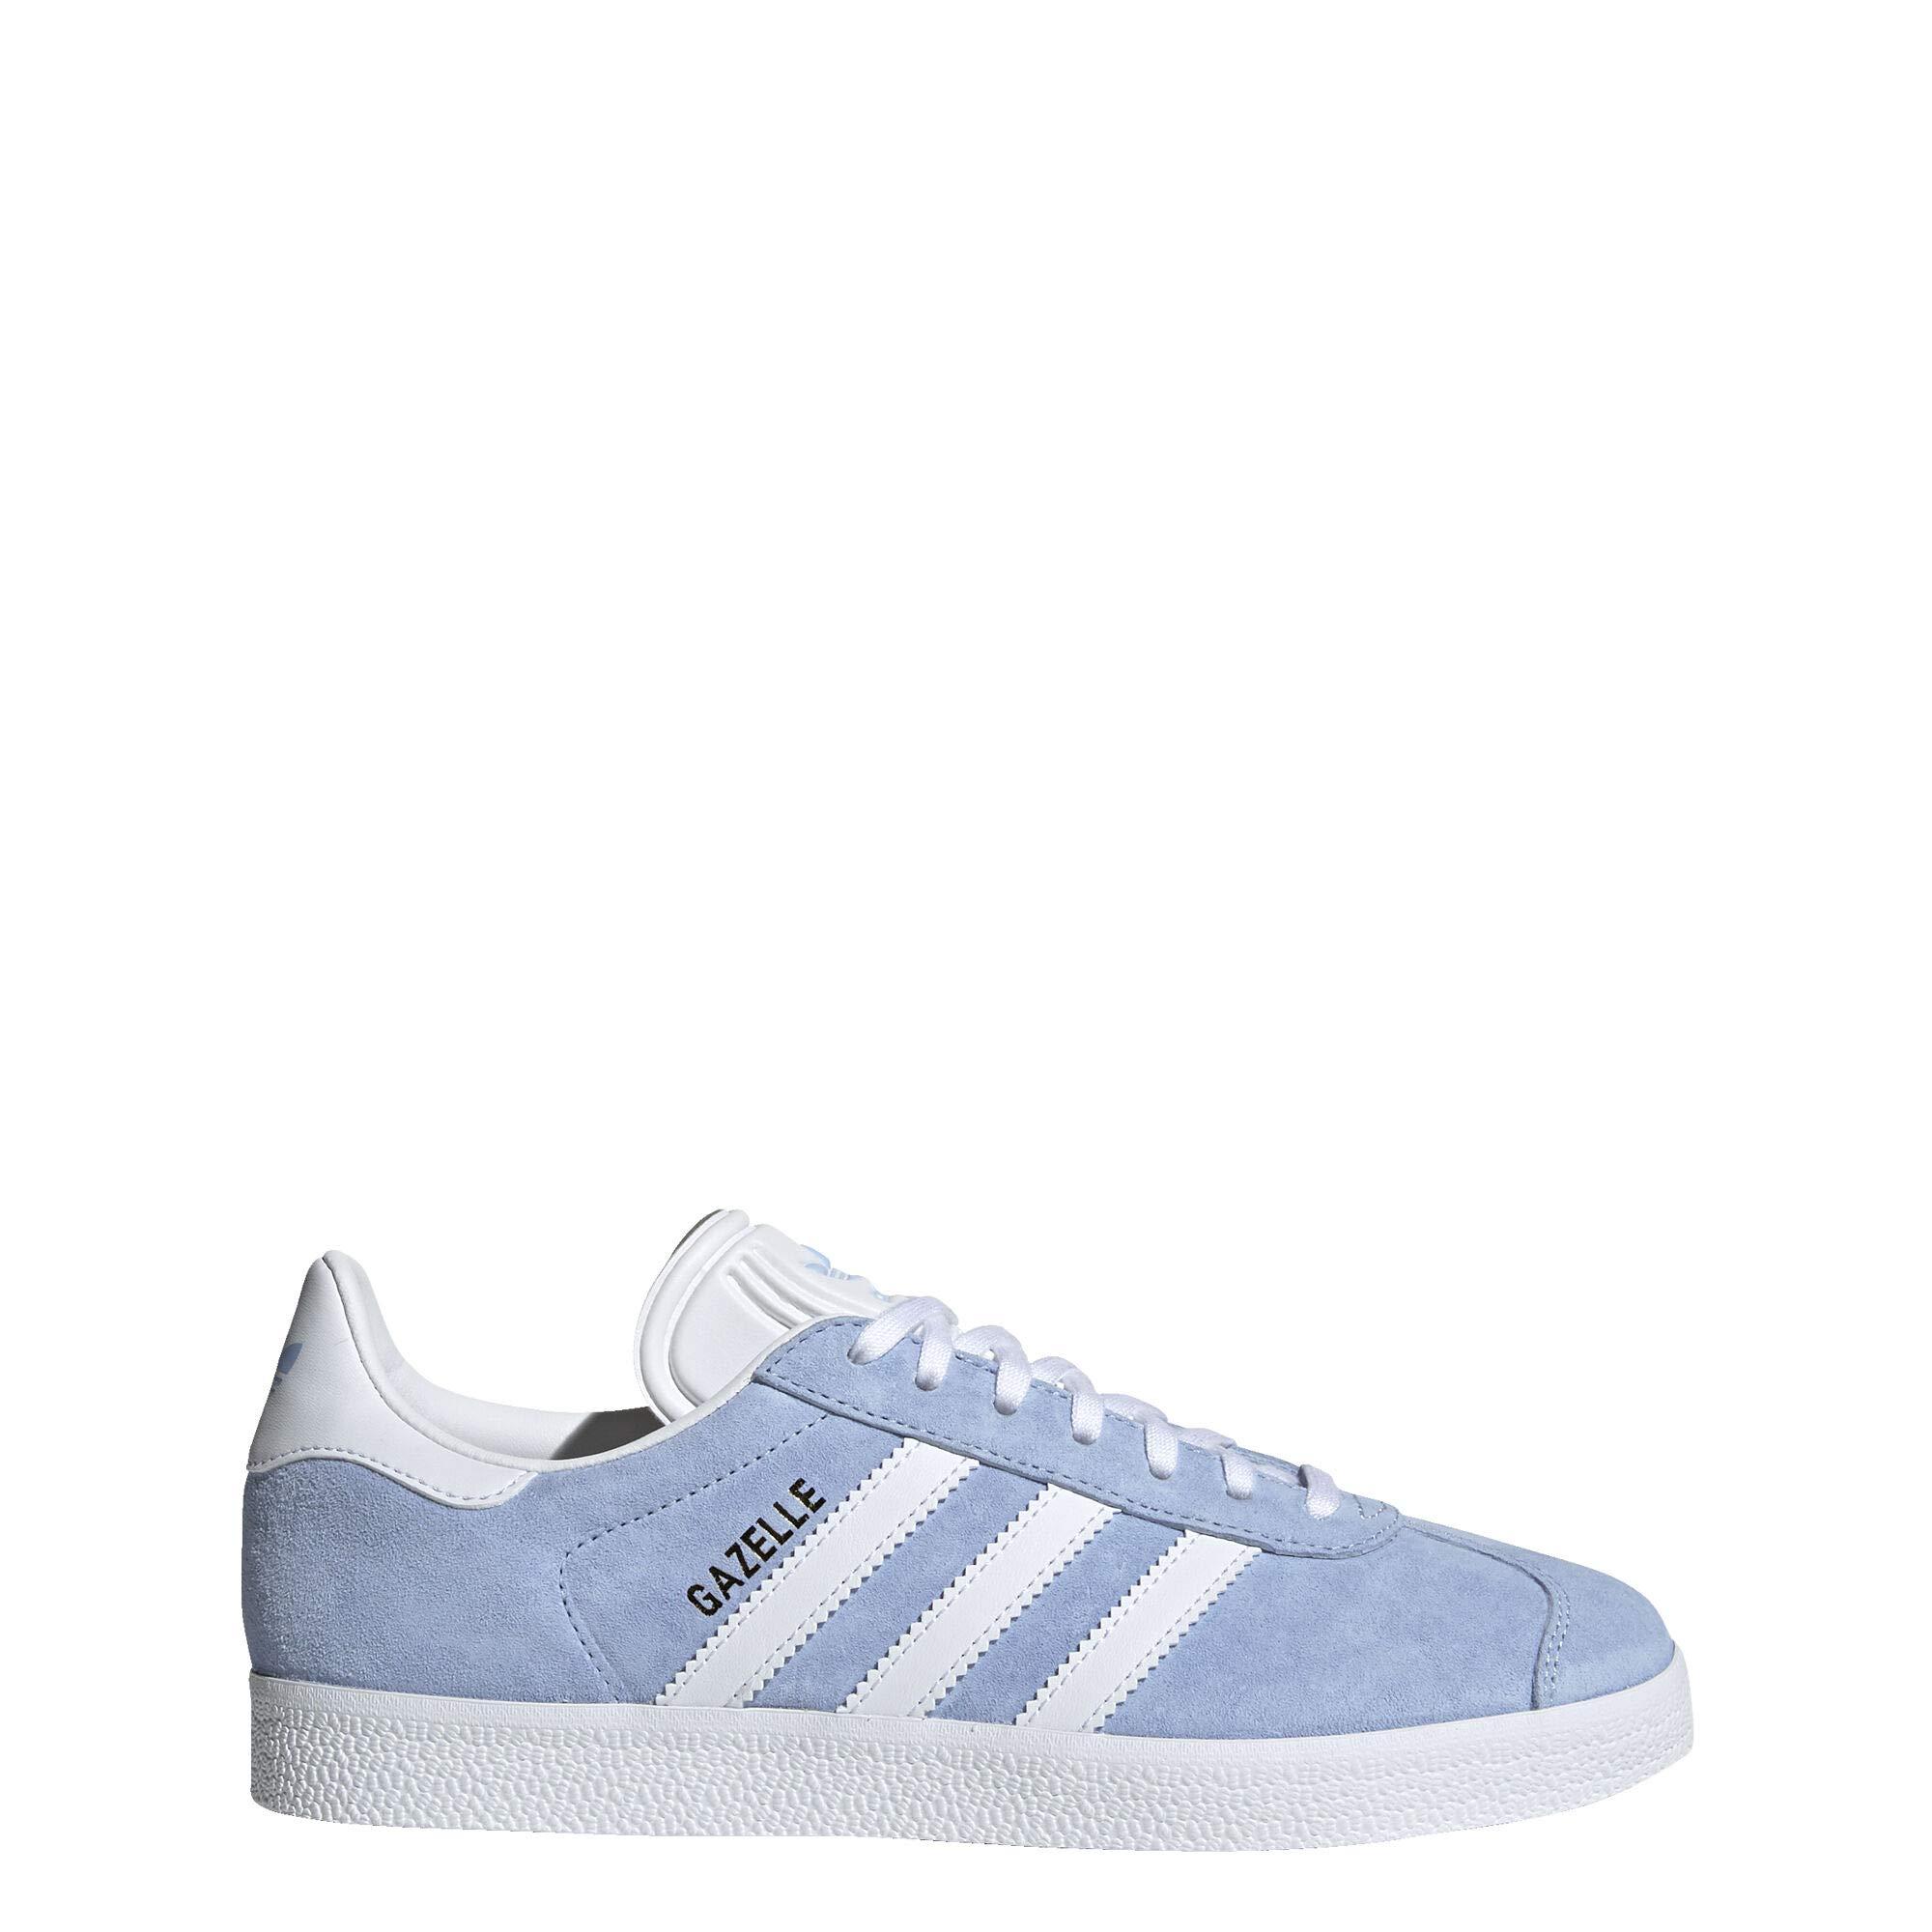 adidas Gazelle Shoes Women's- Buy